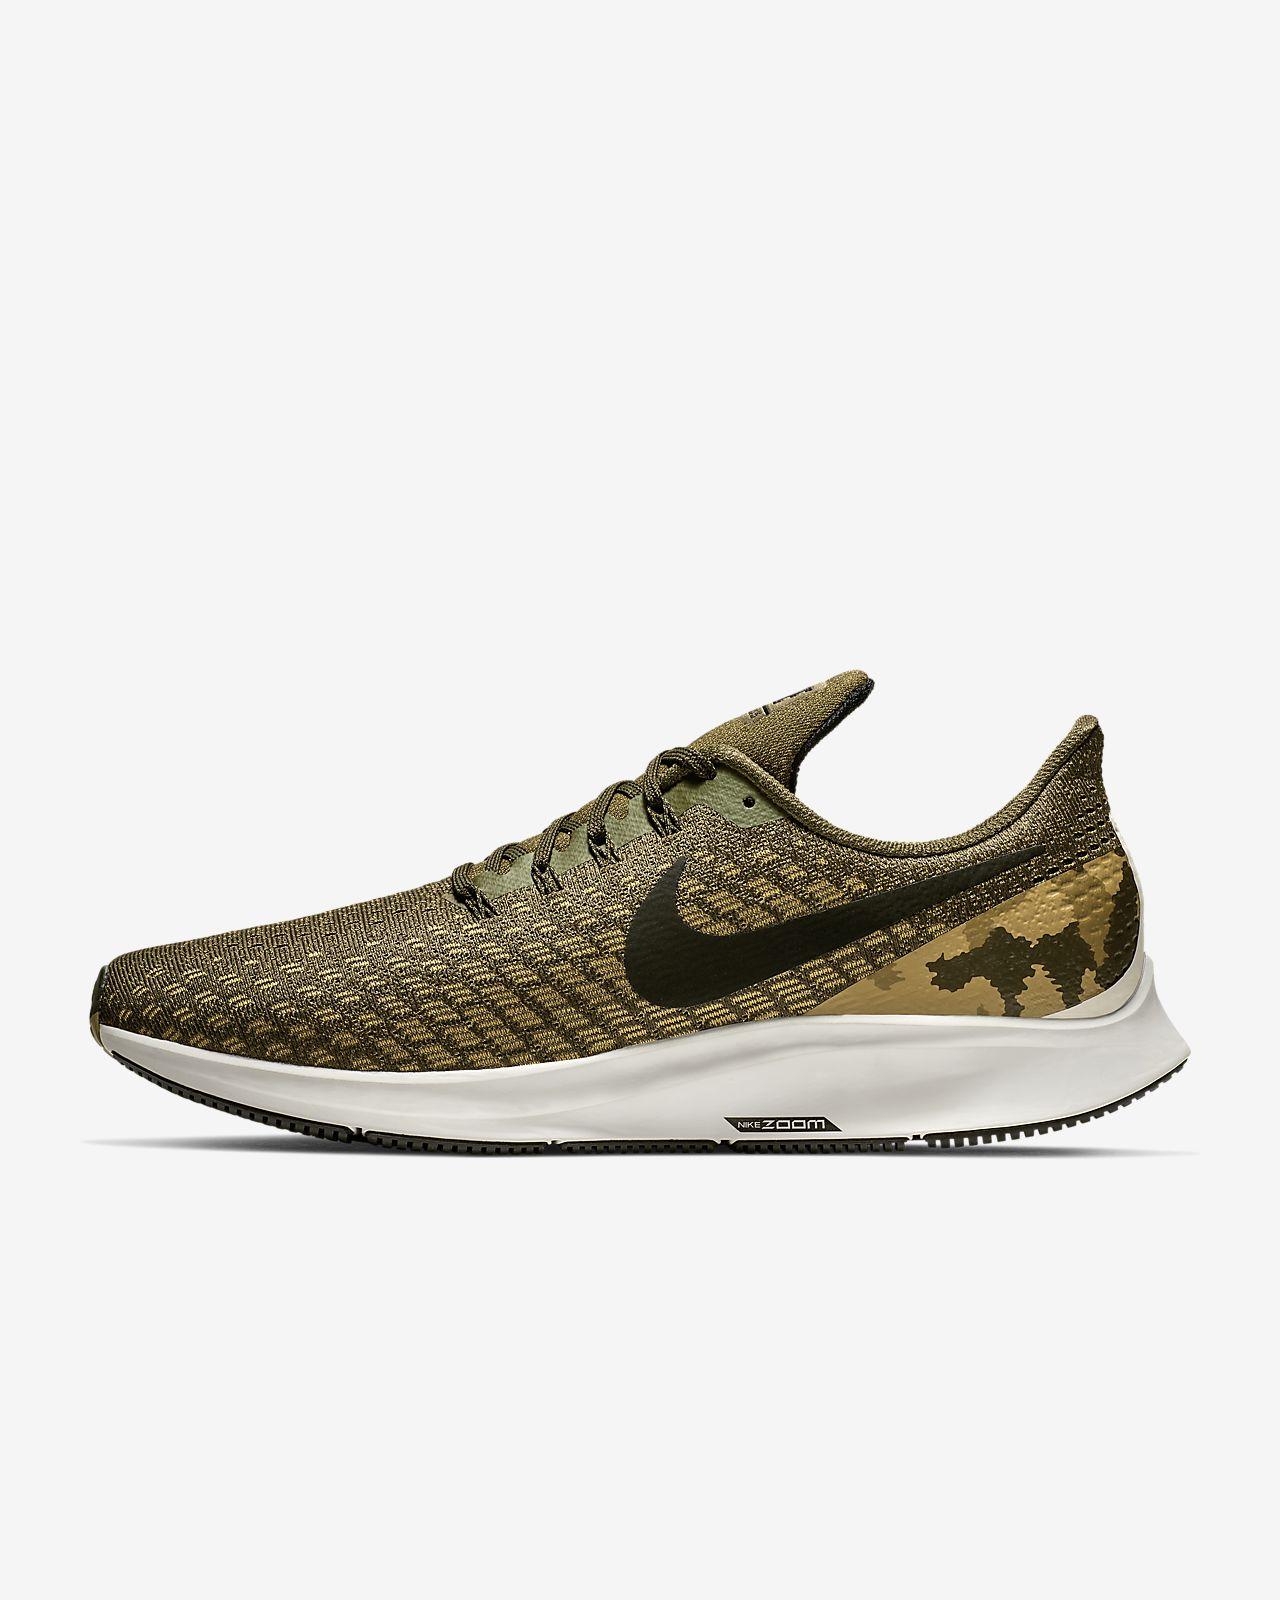 b69e7e896993b9 Nike Air Zoom Pegasus 35 Men s Camo Running Shoe. Nike.com